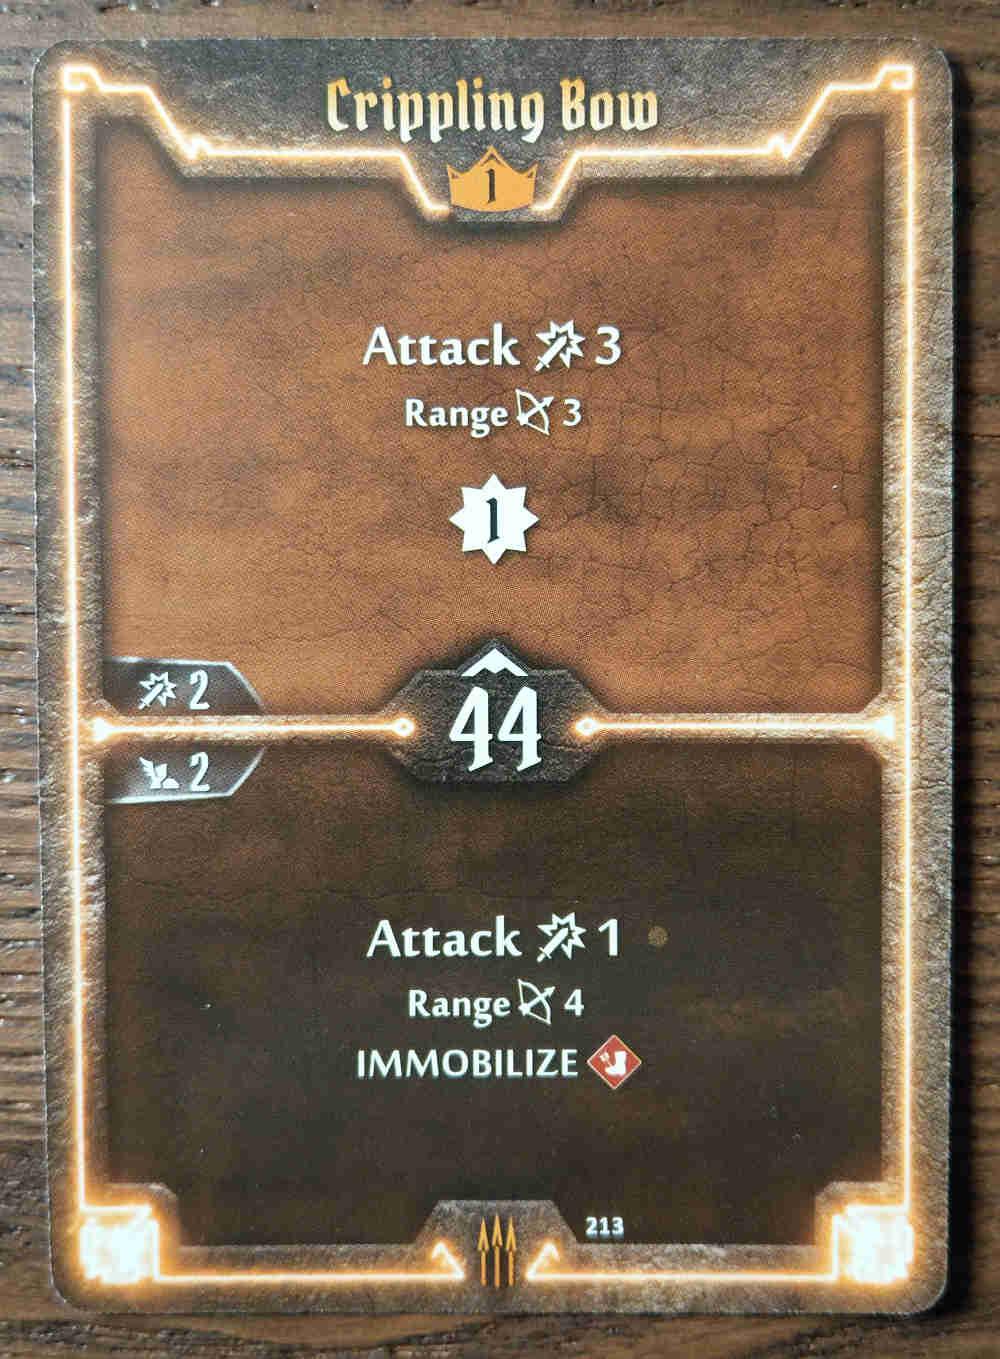 Level 1 Quartermaster card Crippling Bow